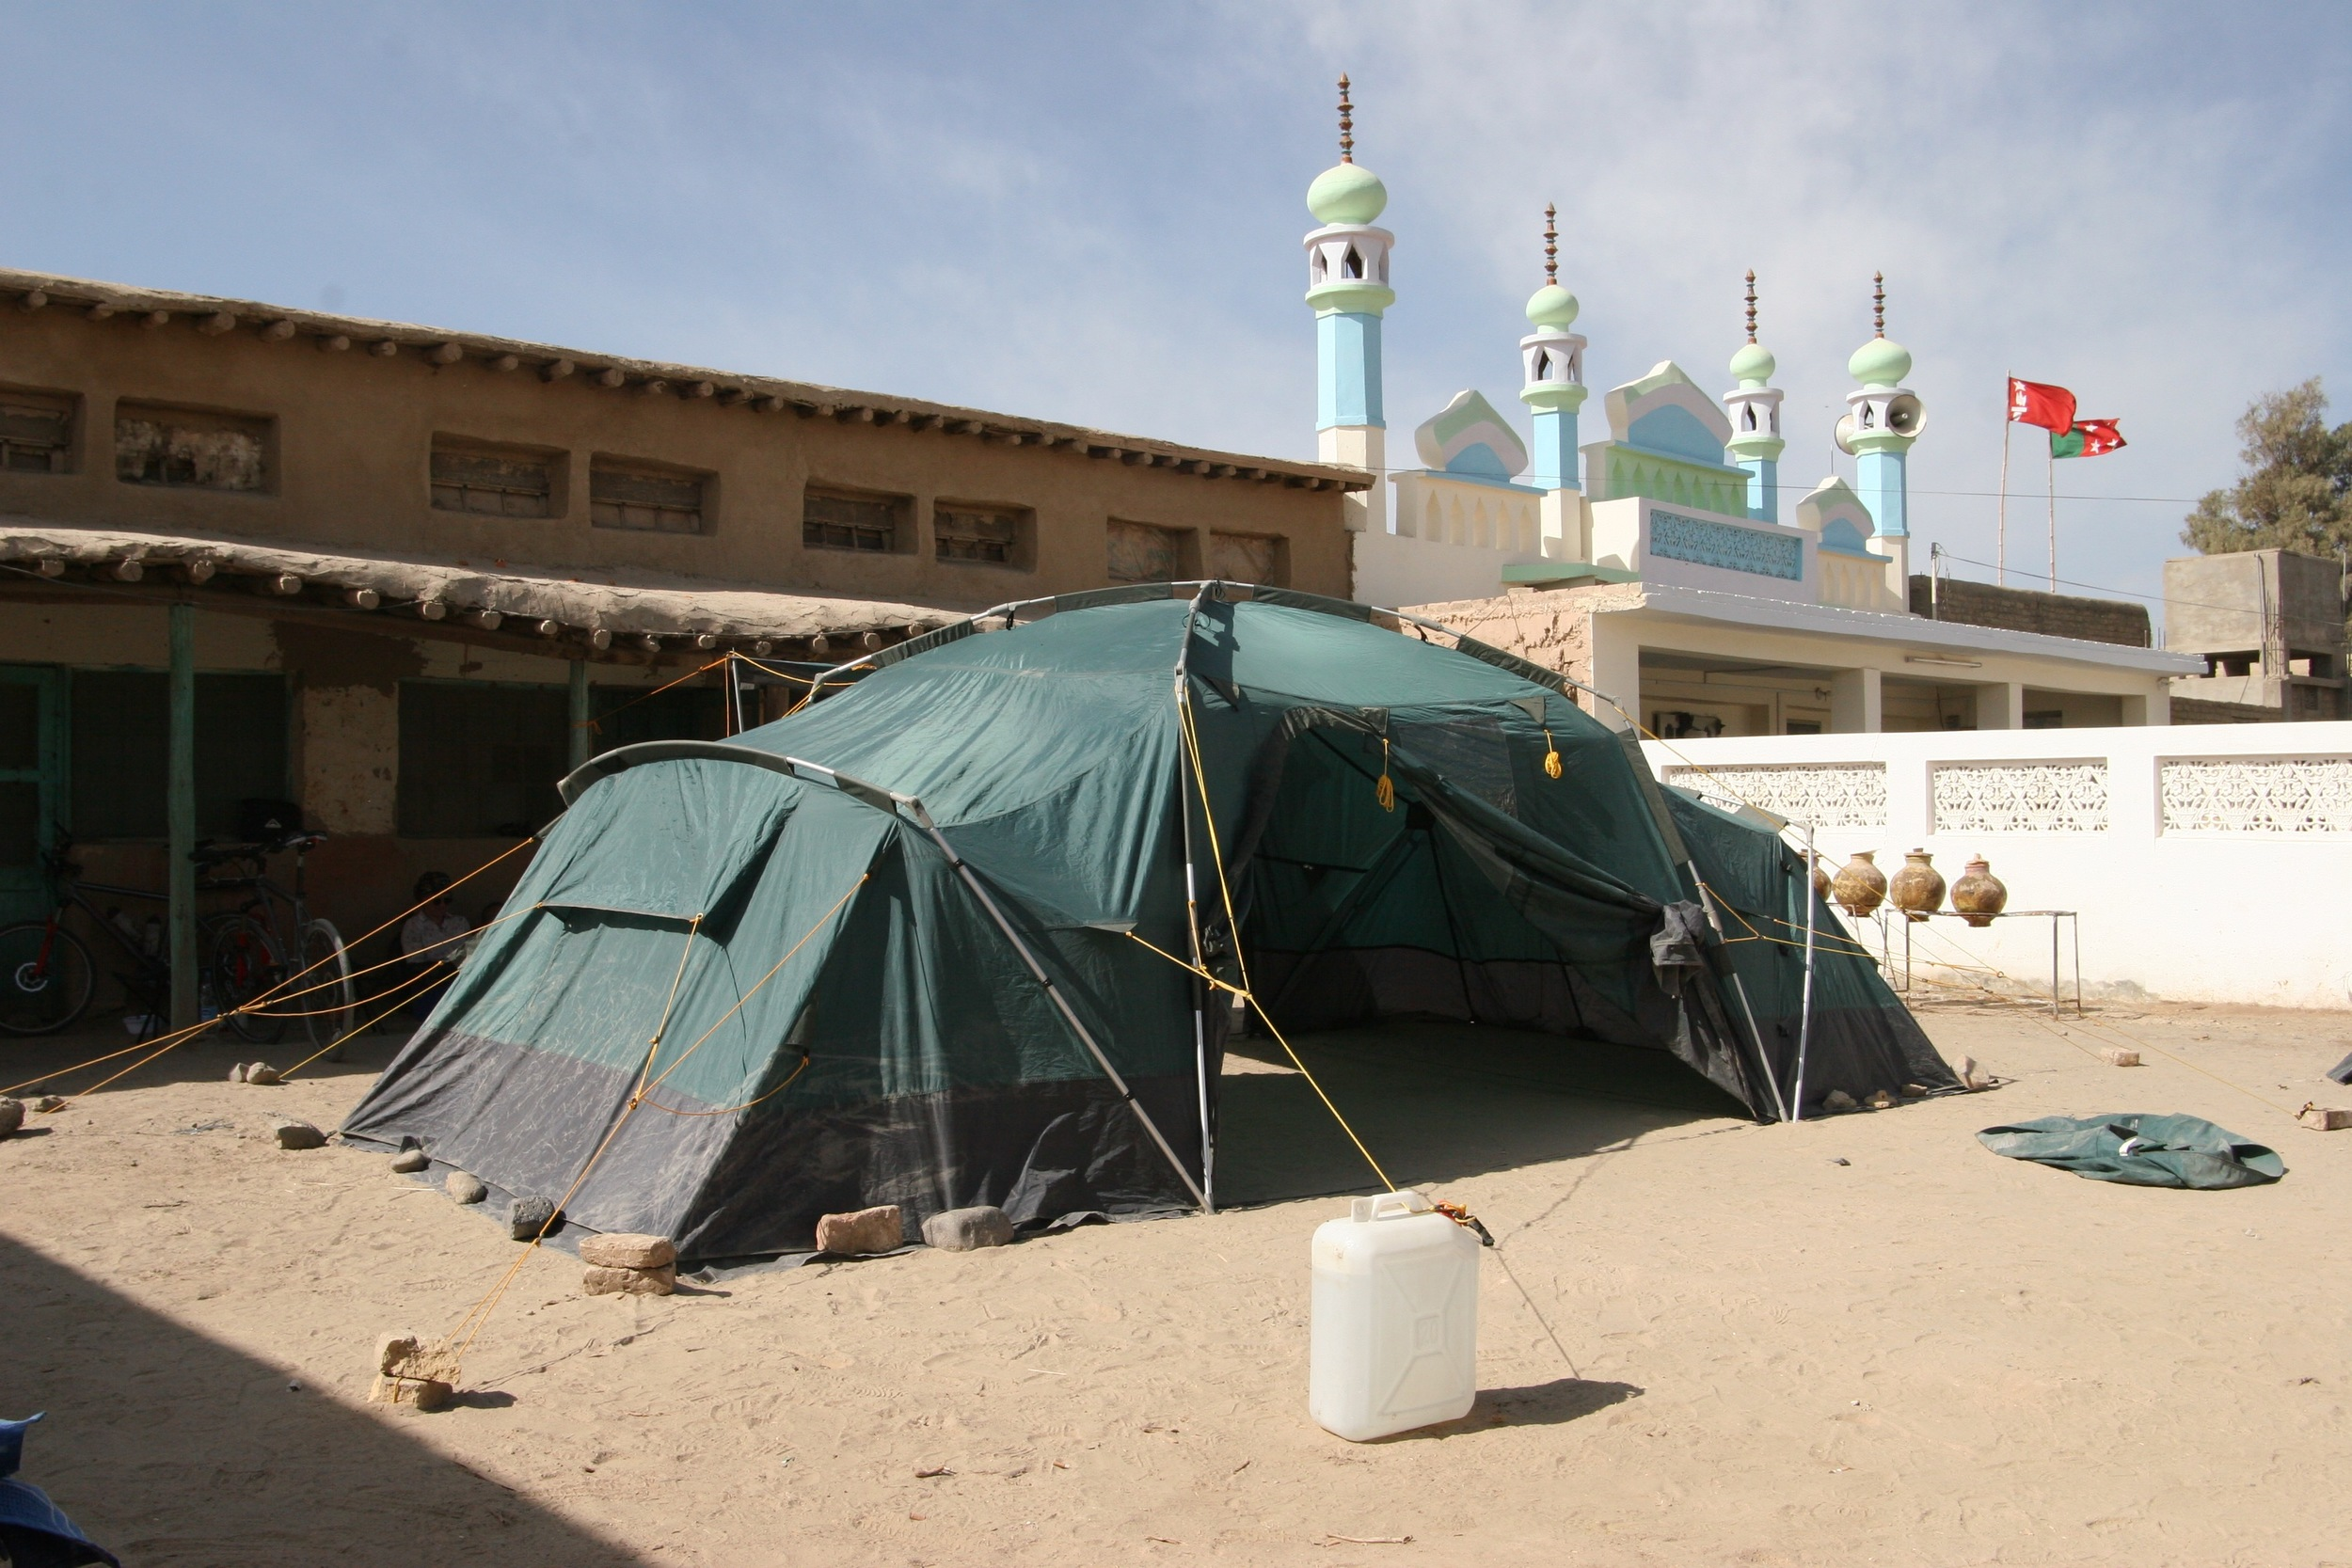 The campsite in Dalbandin customs house